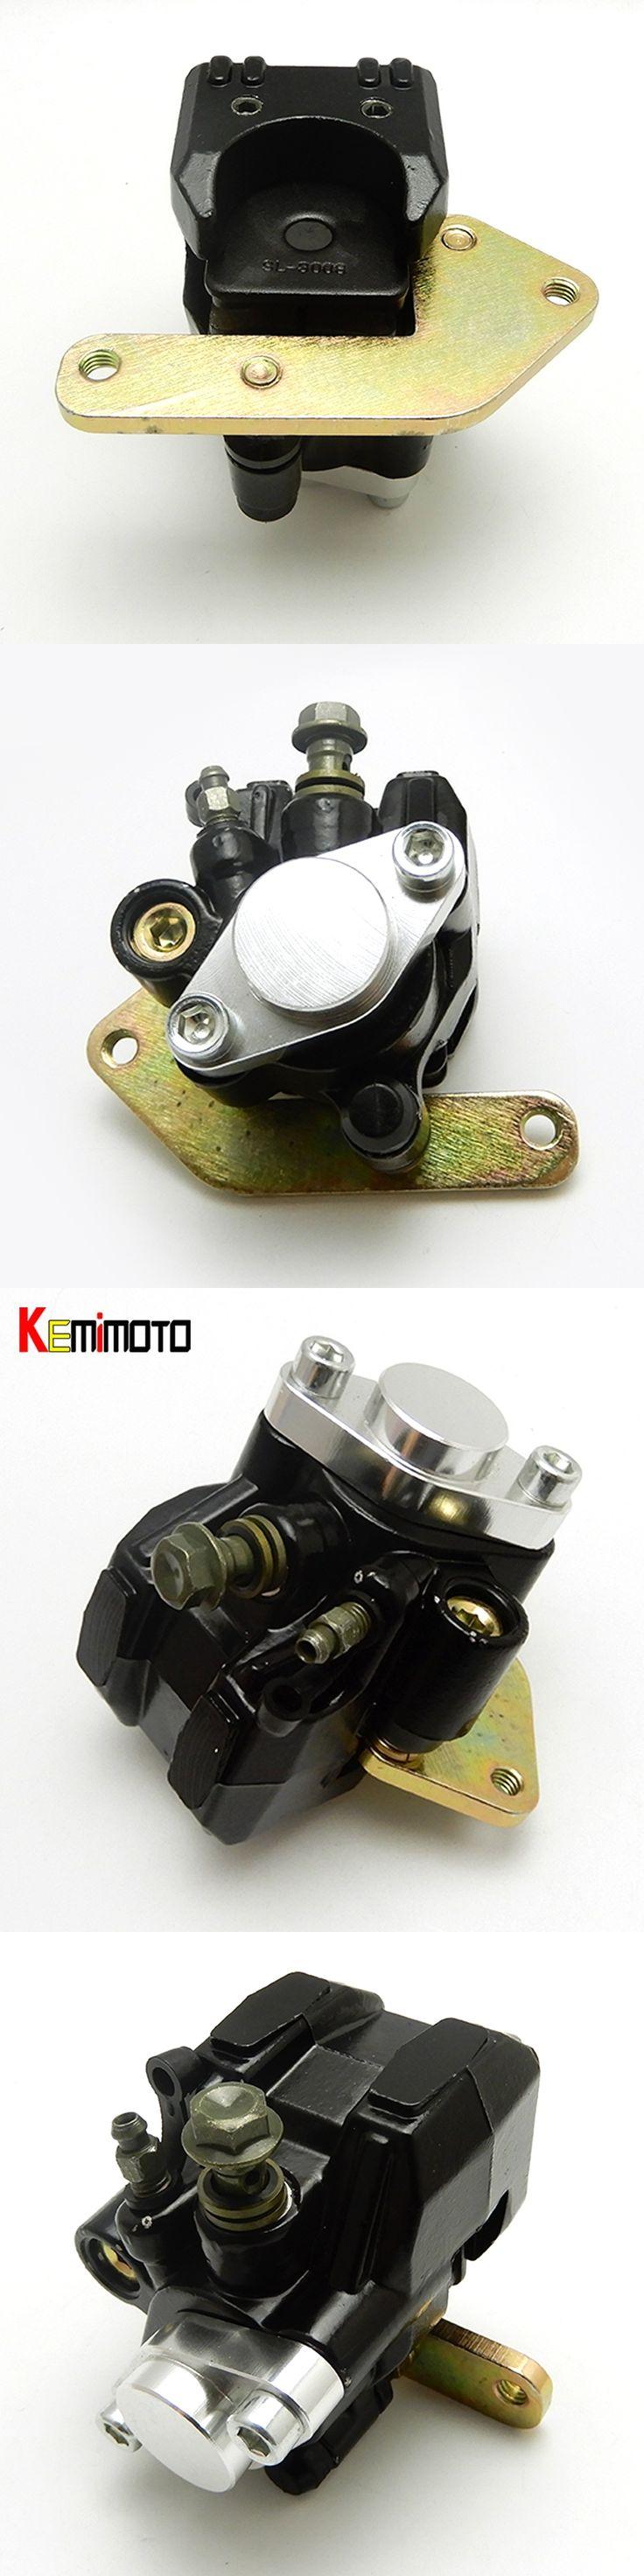 KEMiMOTO ATV Rear Hydraulic Brake Caliper Assembly for YAMAHA BANSHEE 350 YFZ350 YFZ350SE YFZ350SP YFZ350LE 1987-2006